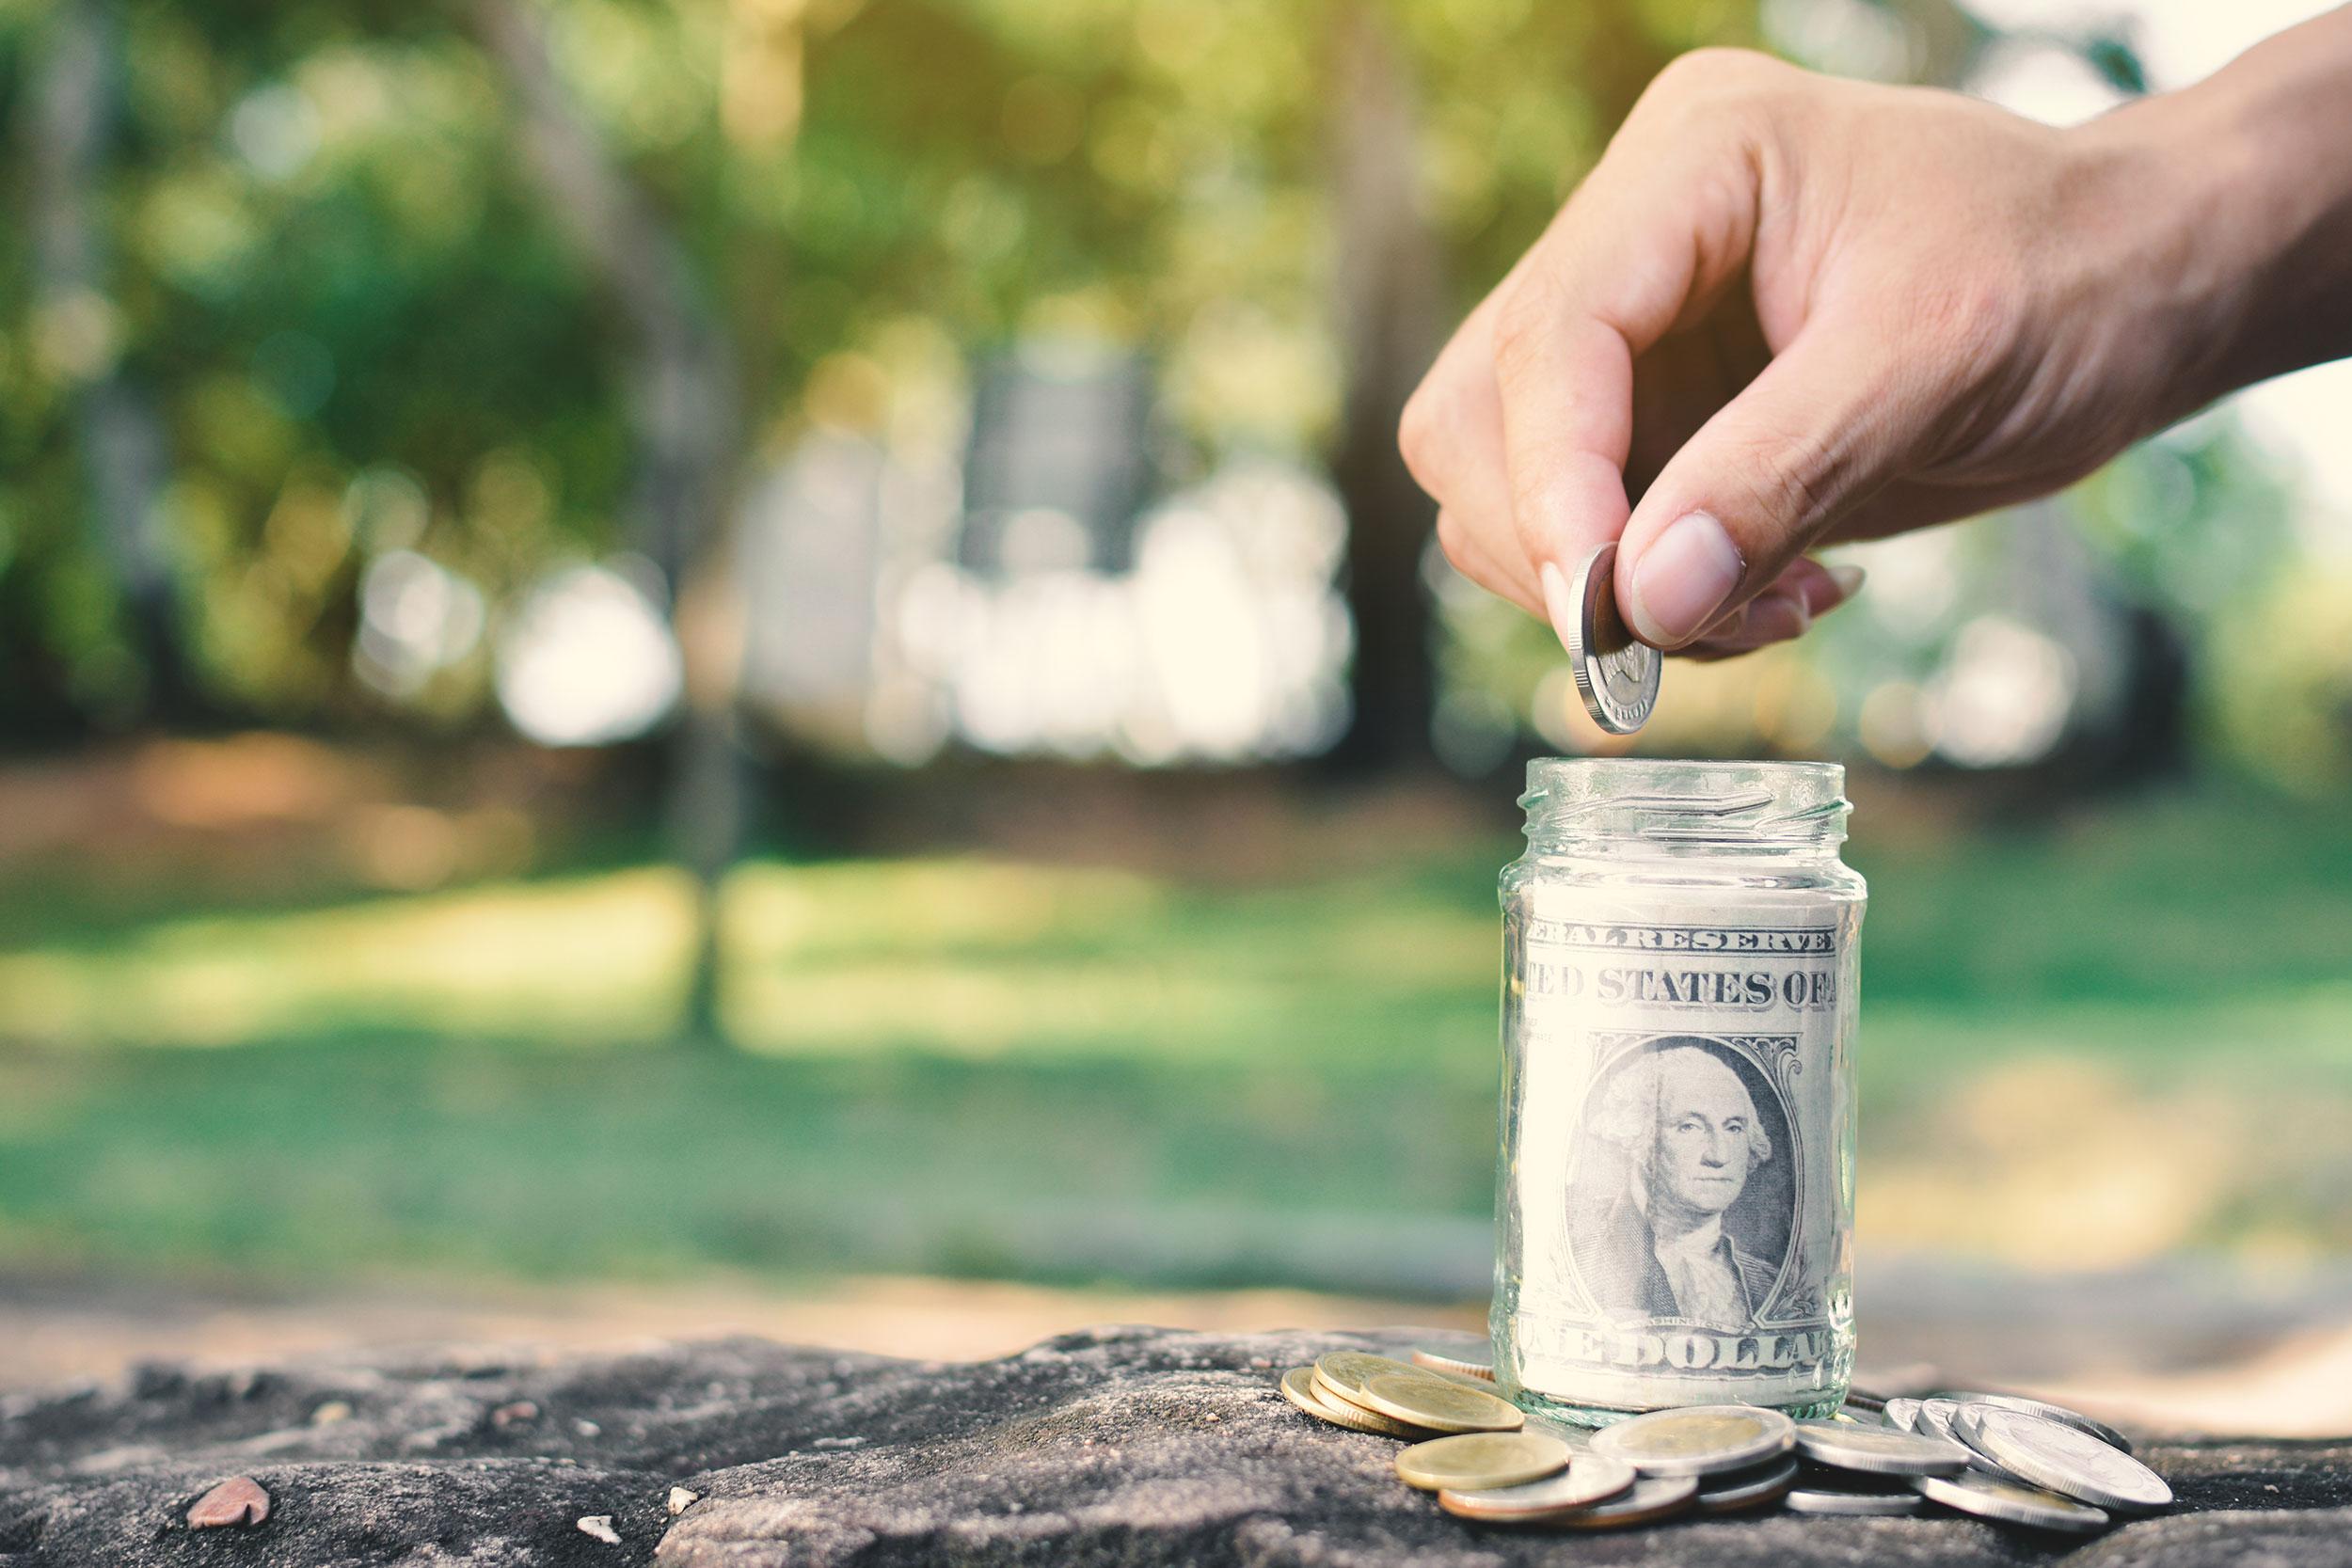 pay back loan, loan forgiveness, saving money, taking a loan, returning a loan